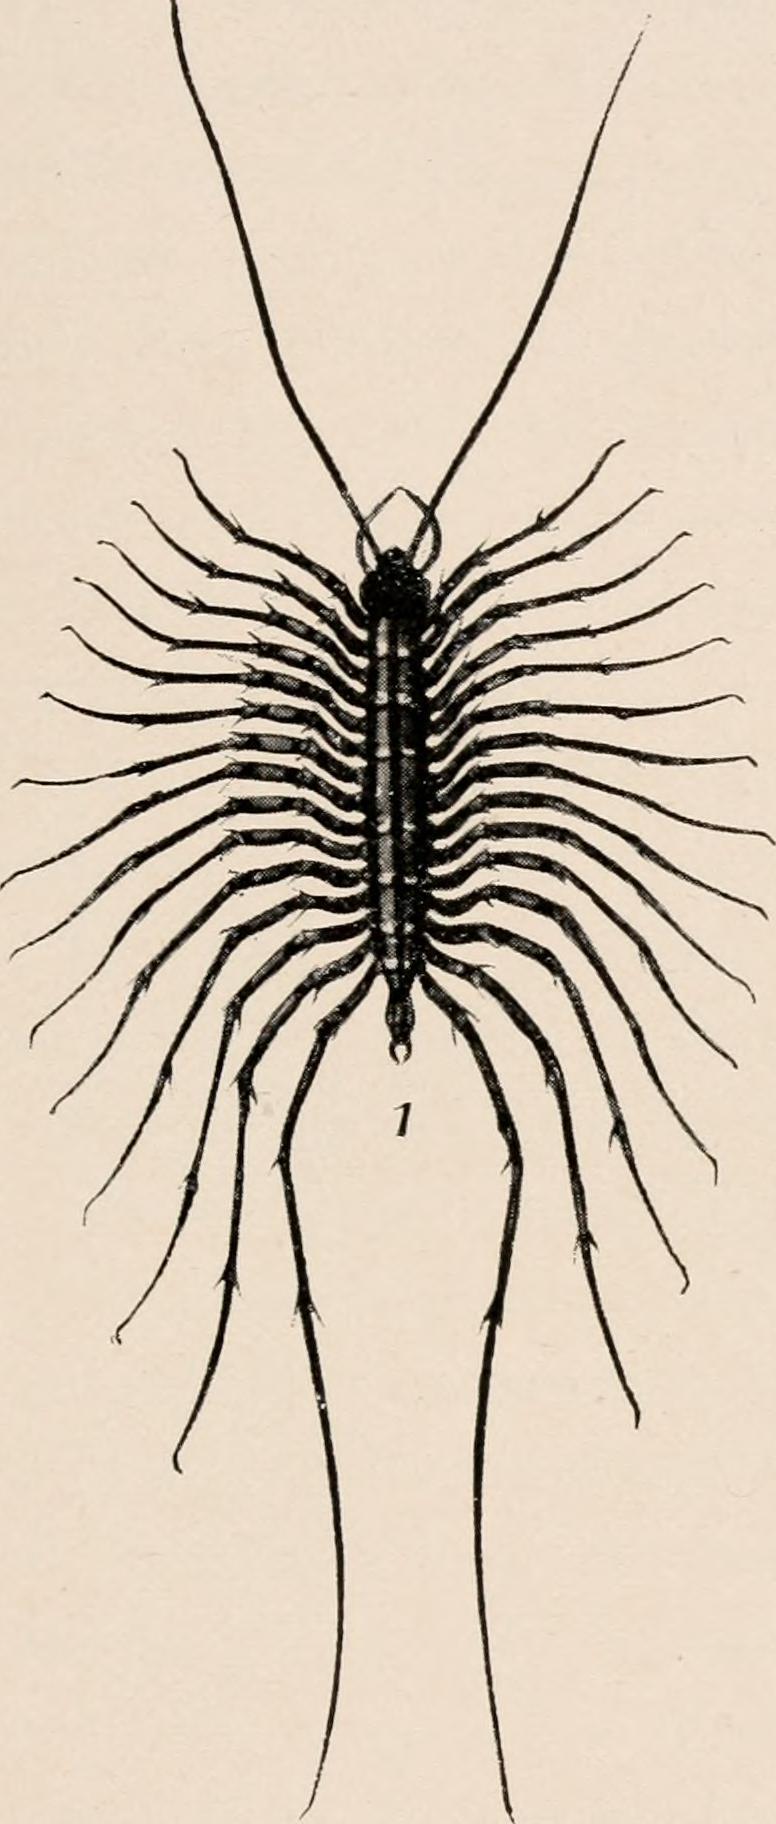 Image of Scutigera